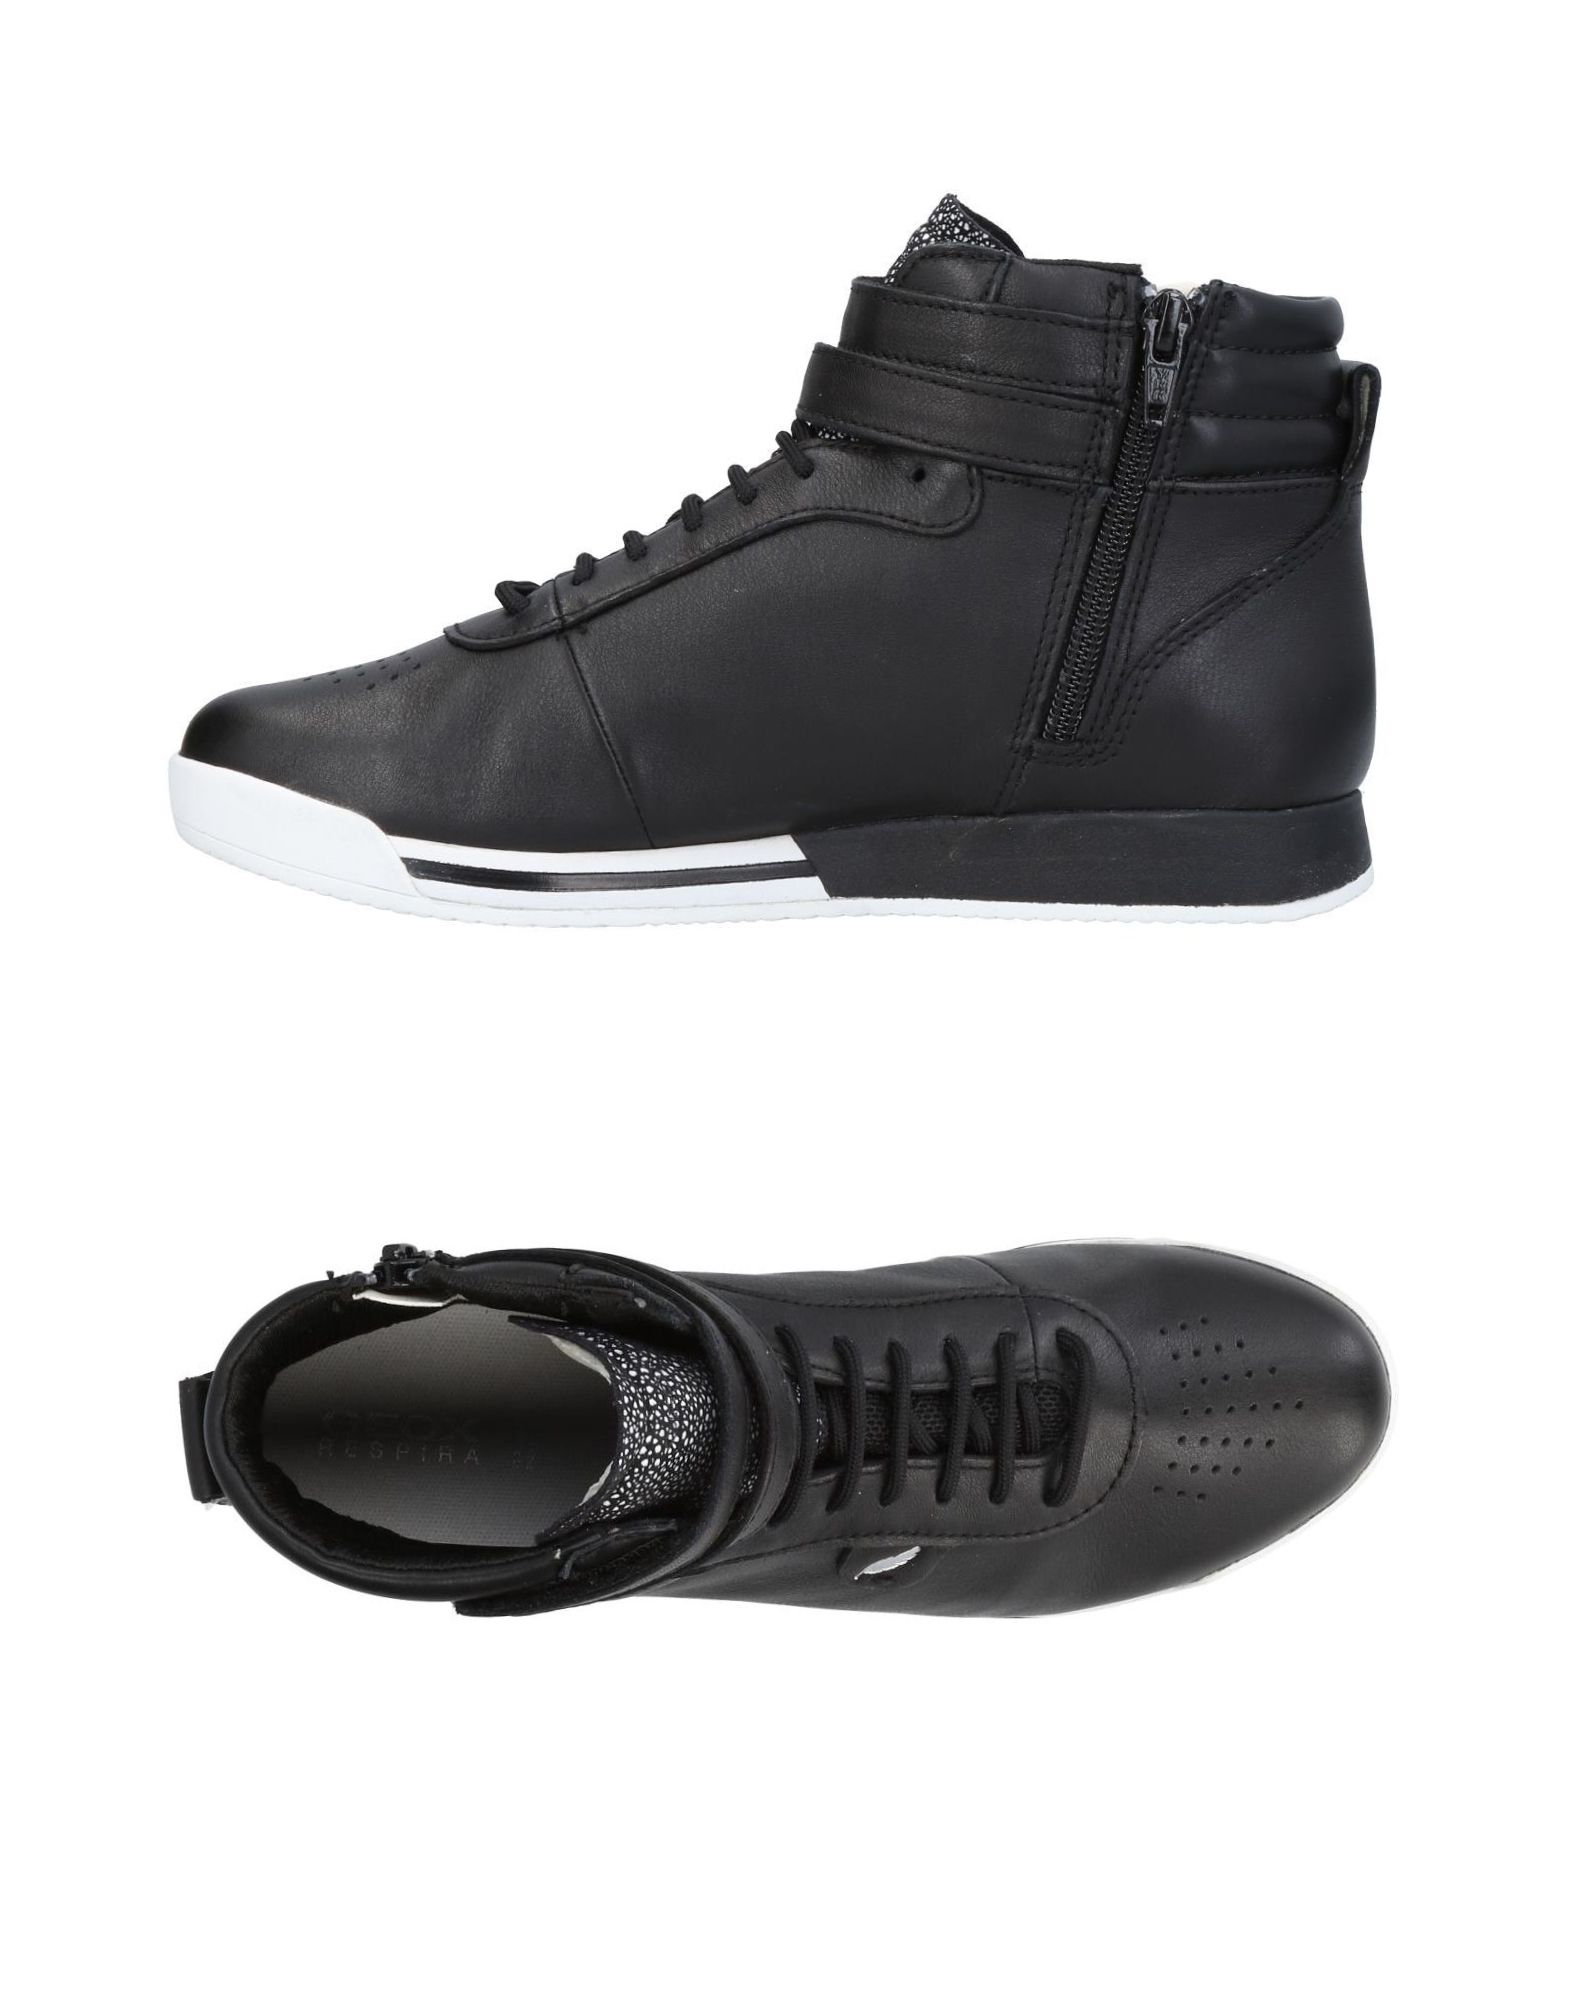 Haltbare Mode billige Schuhe Geox Sneakers Damen  11415732DG Heiße Schuhe